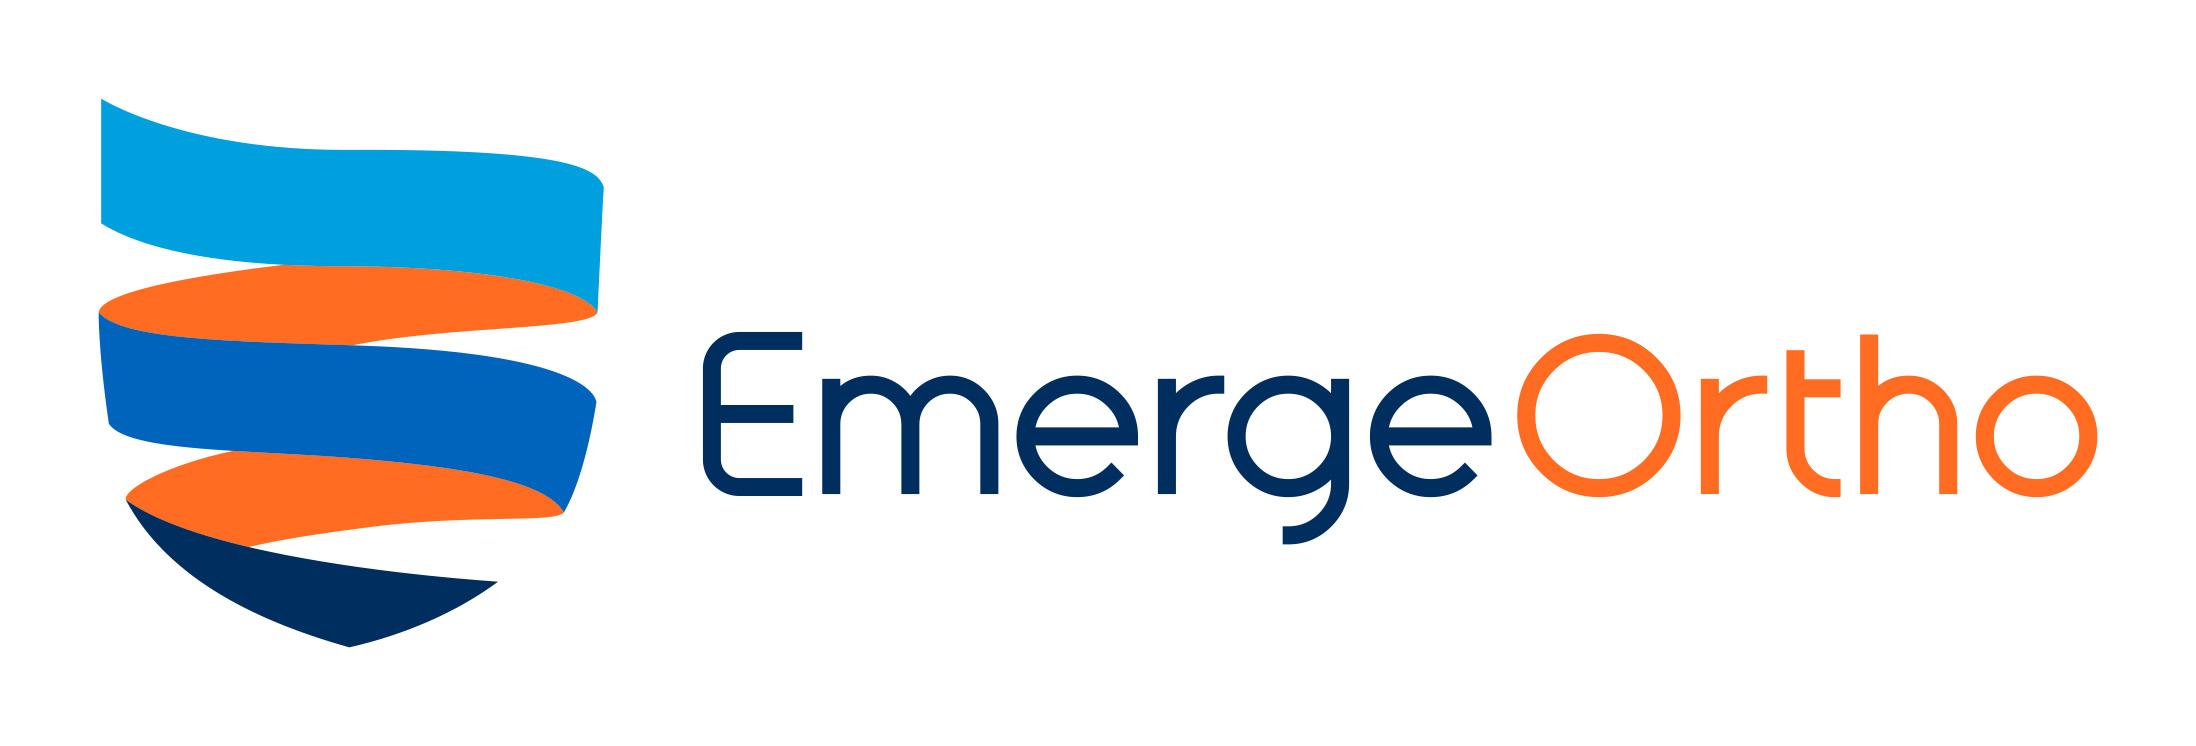 Emergeortho-Erwin